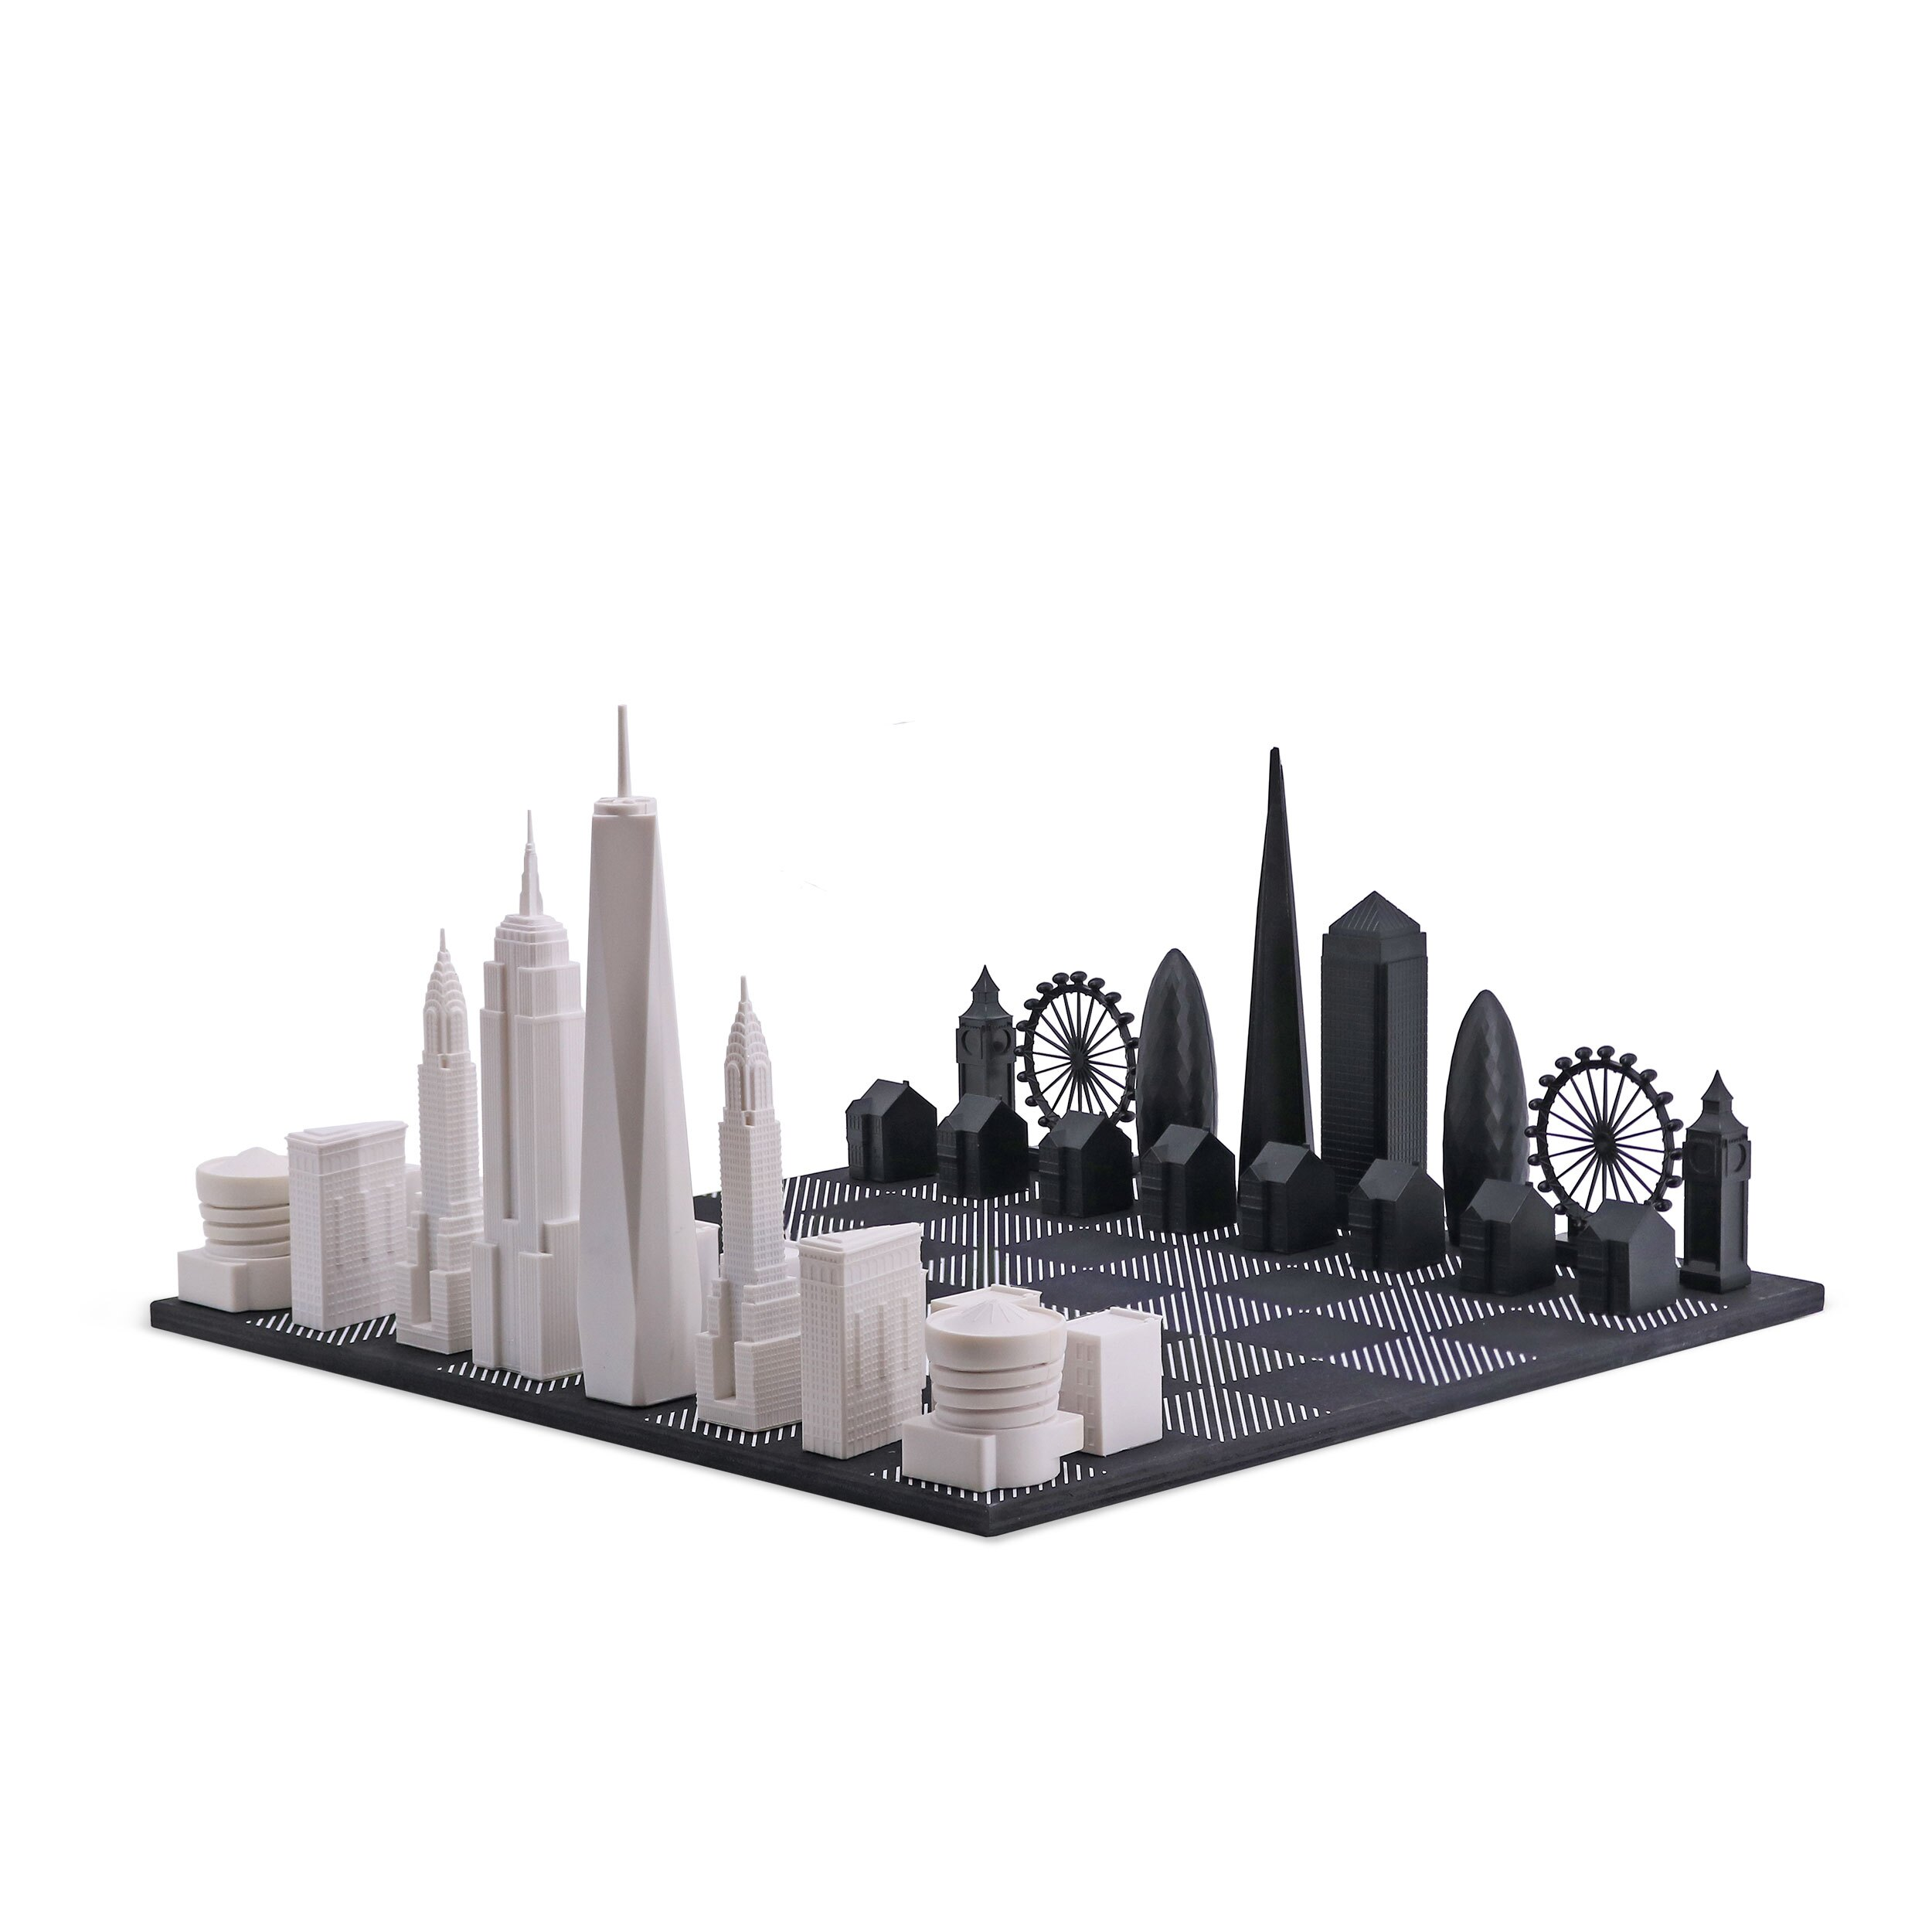 Skyline 天空之城地標西洋棋-甲板(木質棋盤) 倫敦 vs. 紐約